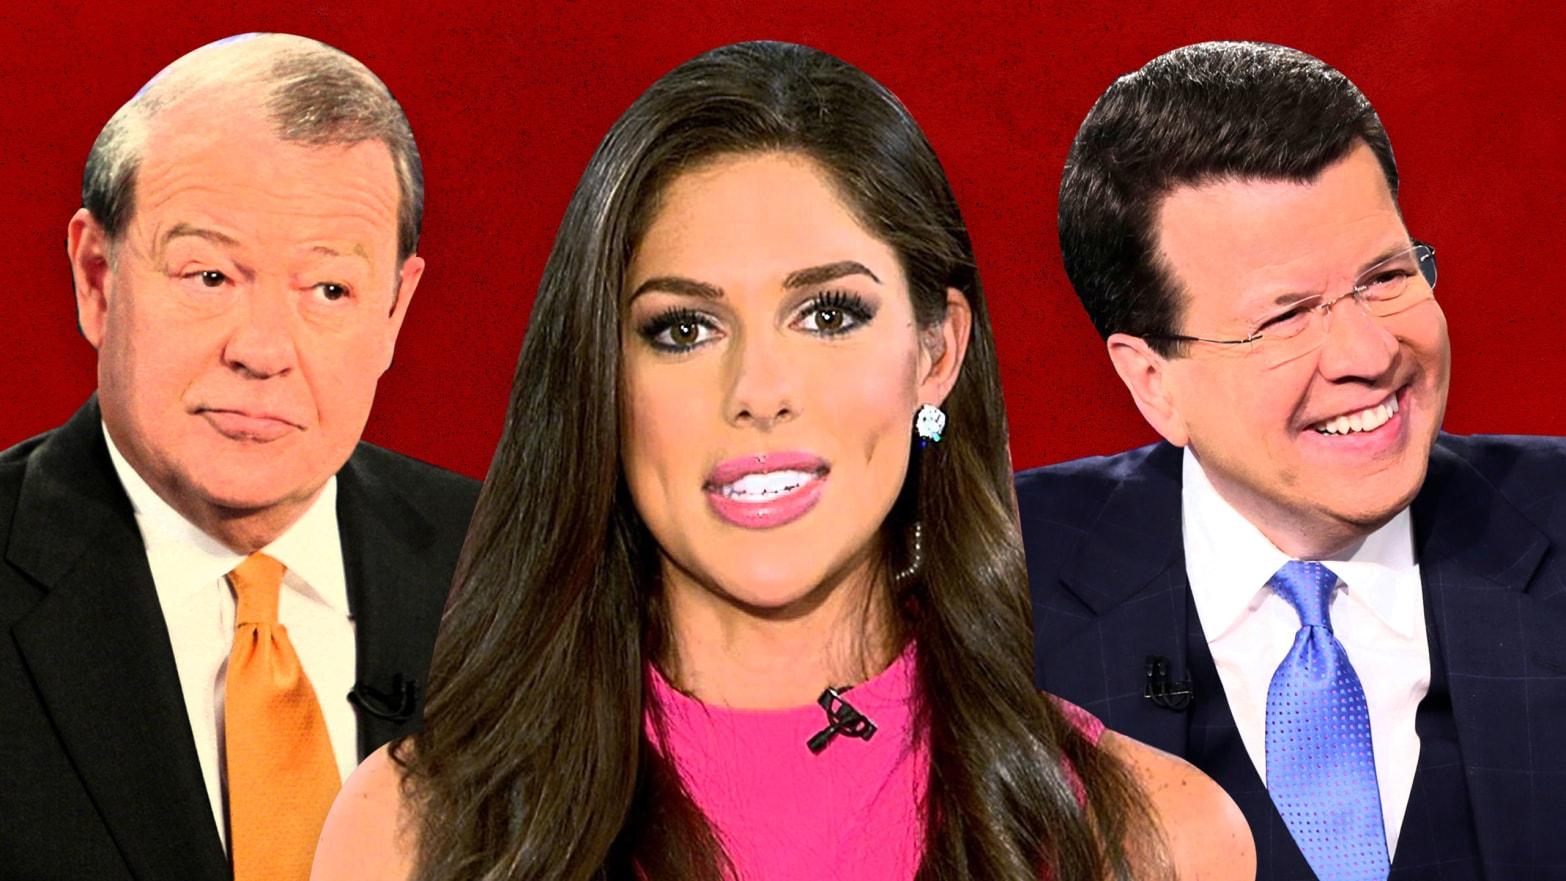 Fox News Hosts Bash Trump's 'Disgusting' Putin Presser